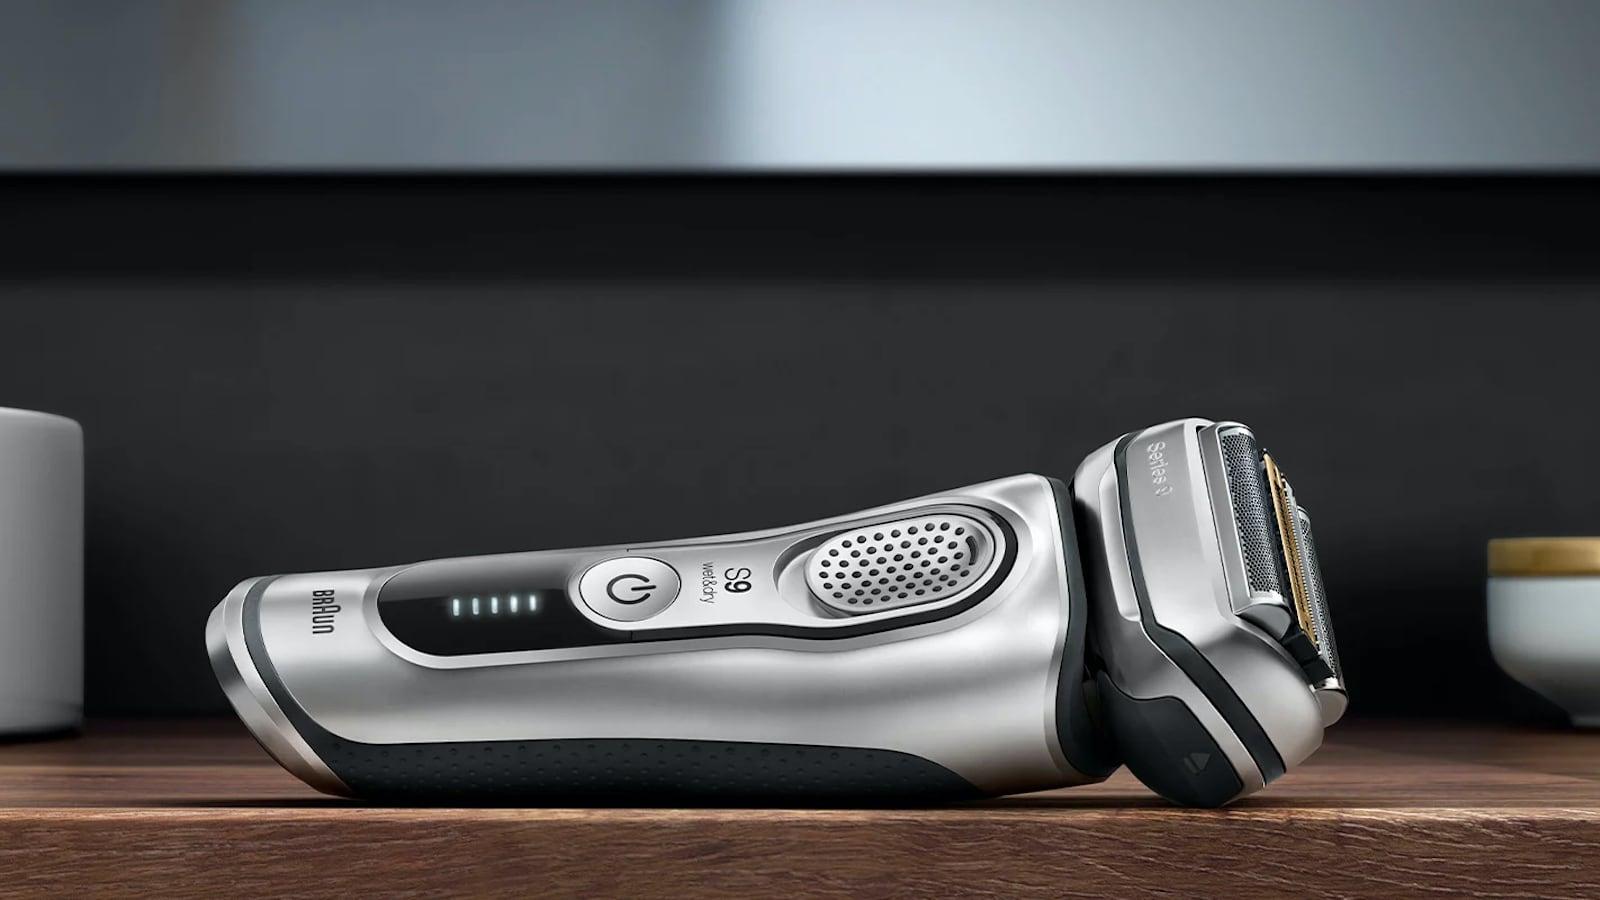 Braun Series 9 Electric Shavers